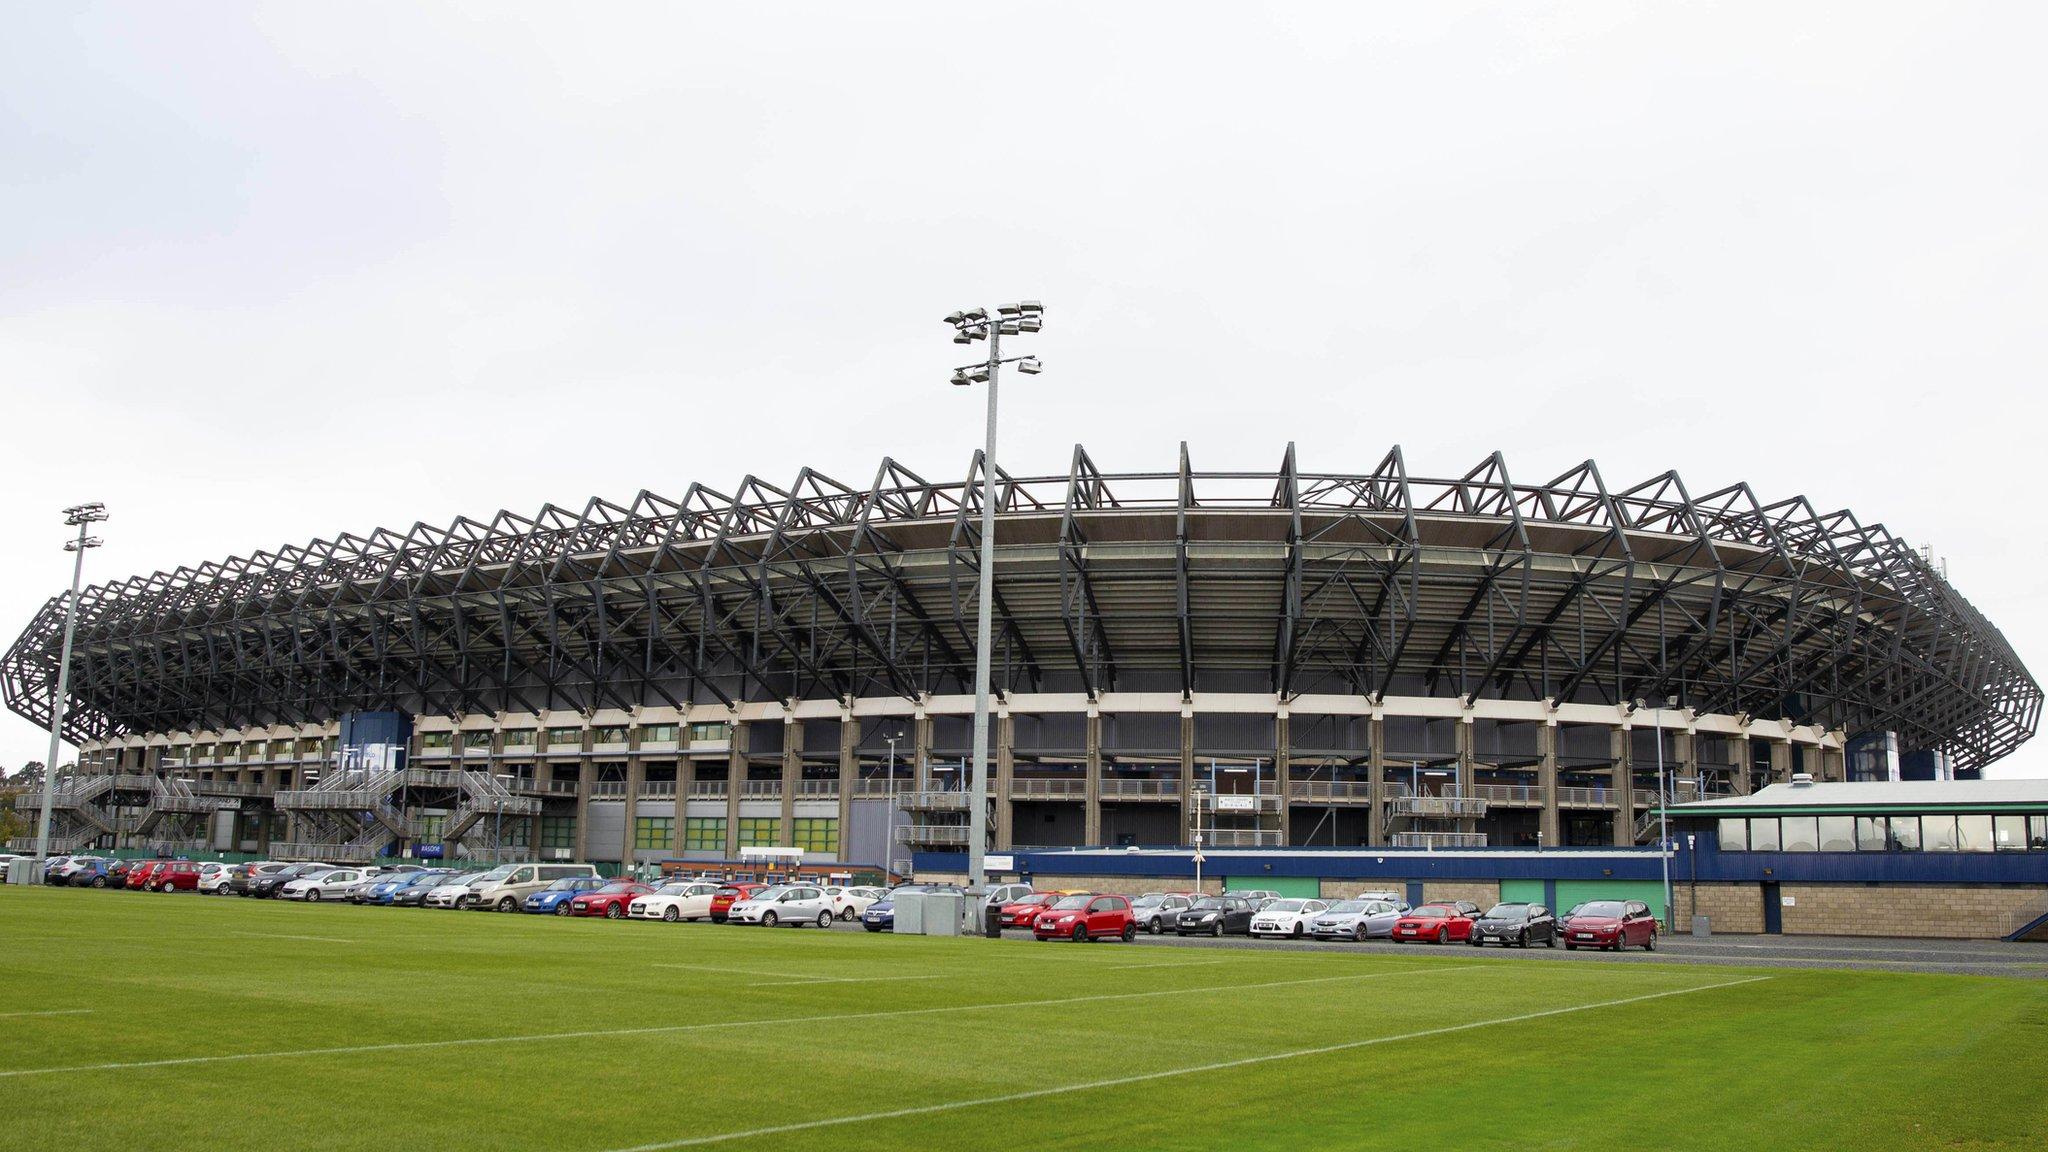 Hearts v Celtic at Murrayfield before Aberdeen v Rangers at Hampden